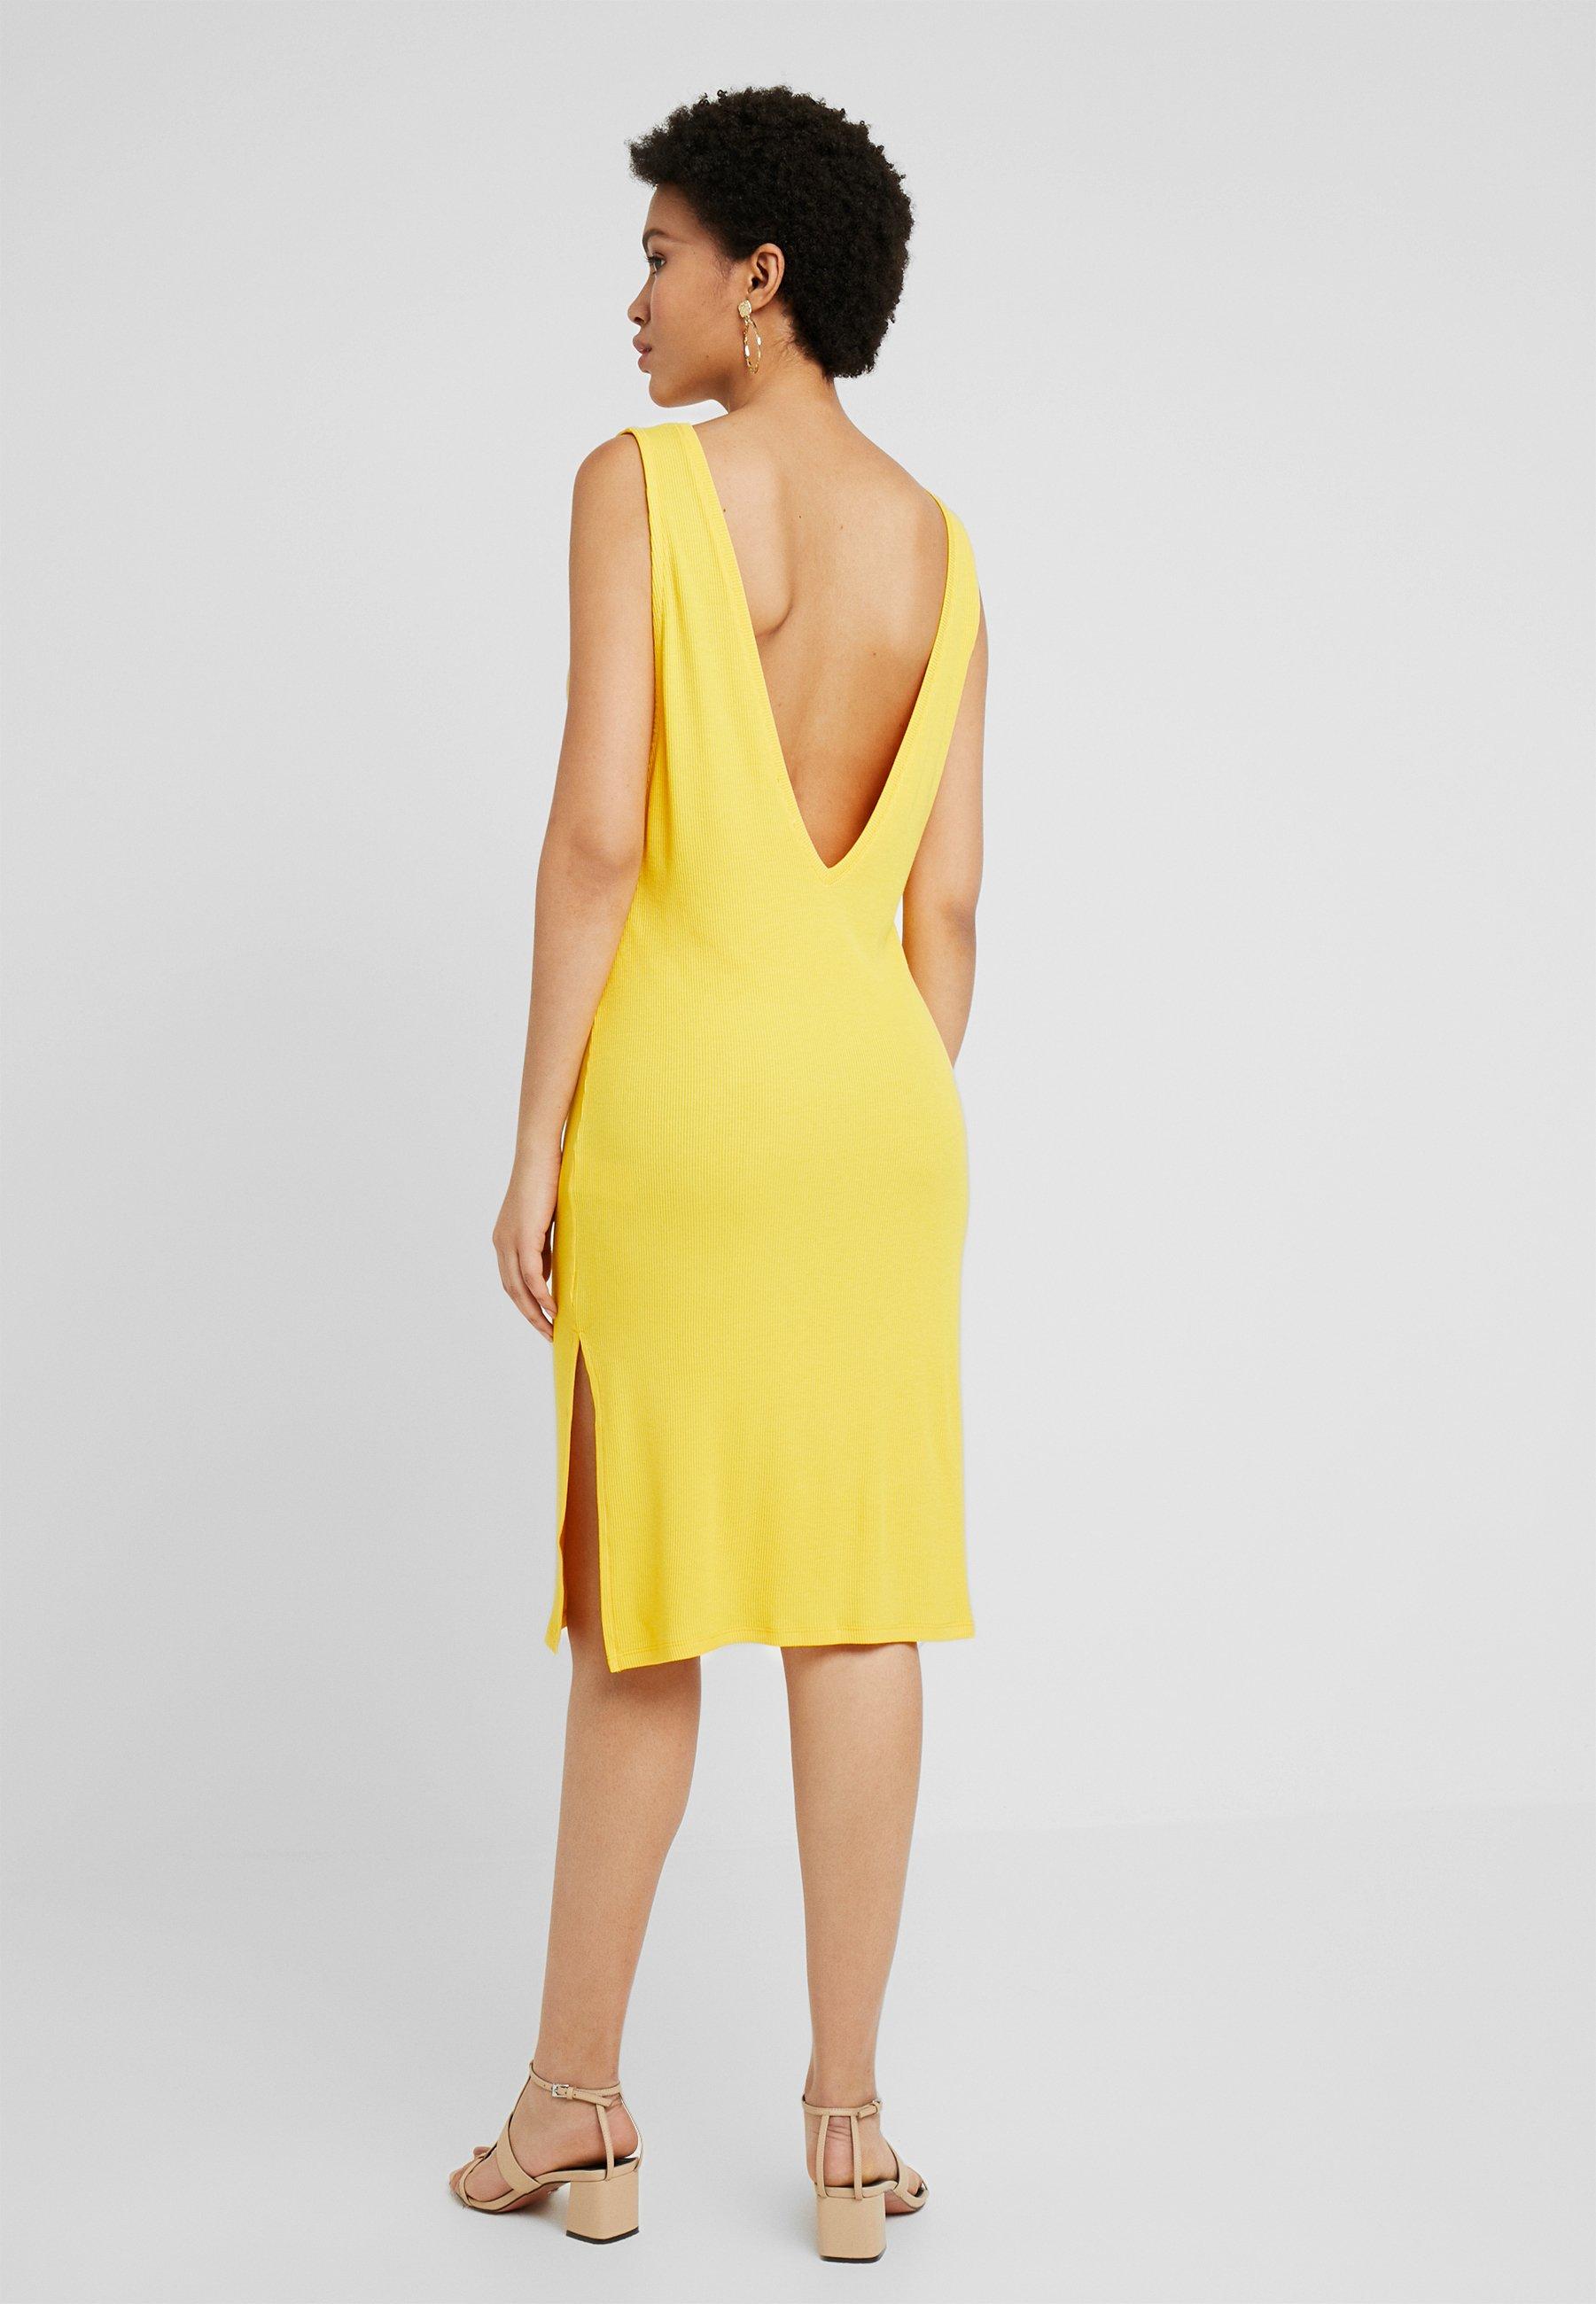 kd Back En Jersey V Deep Yellow Hoss DressRobe Na Relaxed u13KclFJT